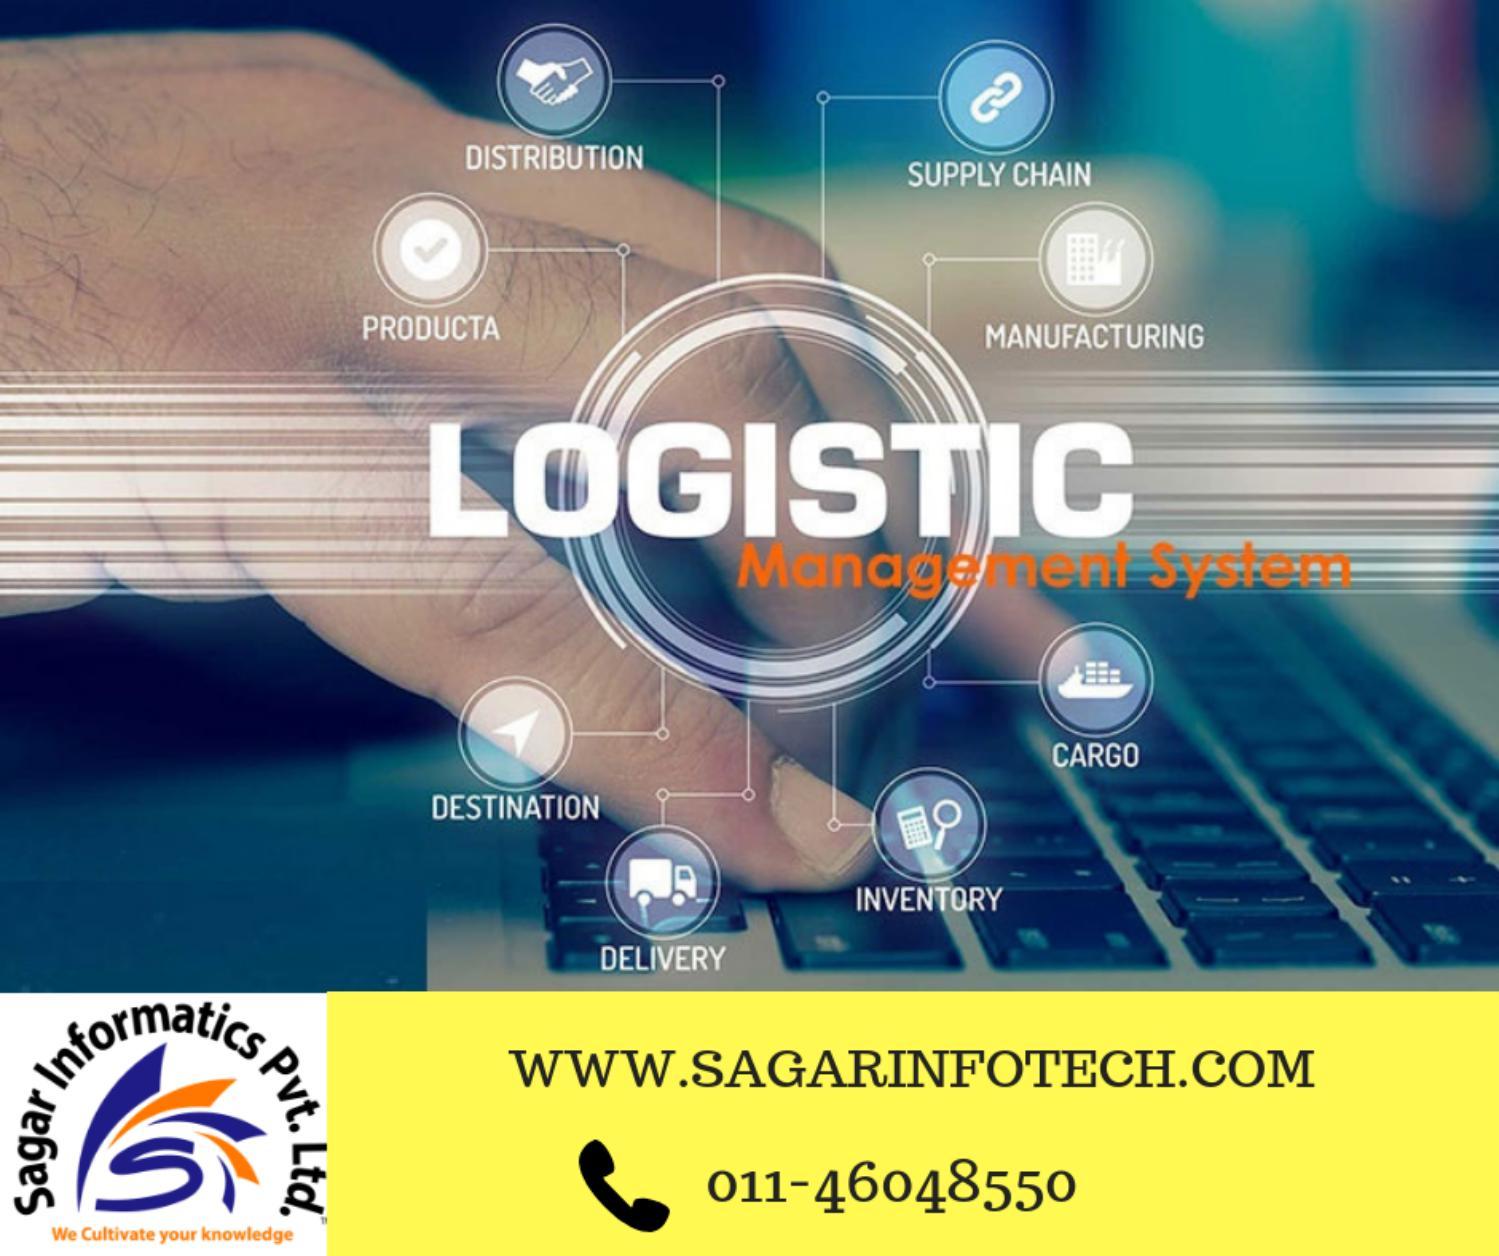 Logistics Management Software by Sagar Informatics Pvt  Ltd